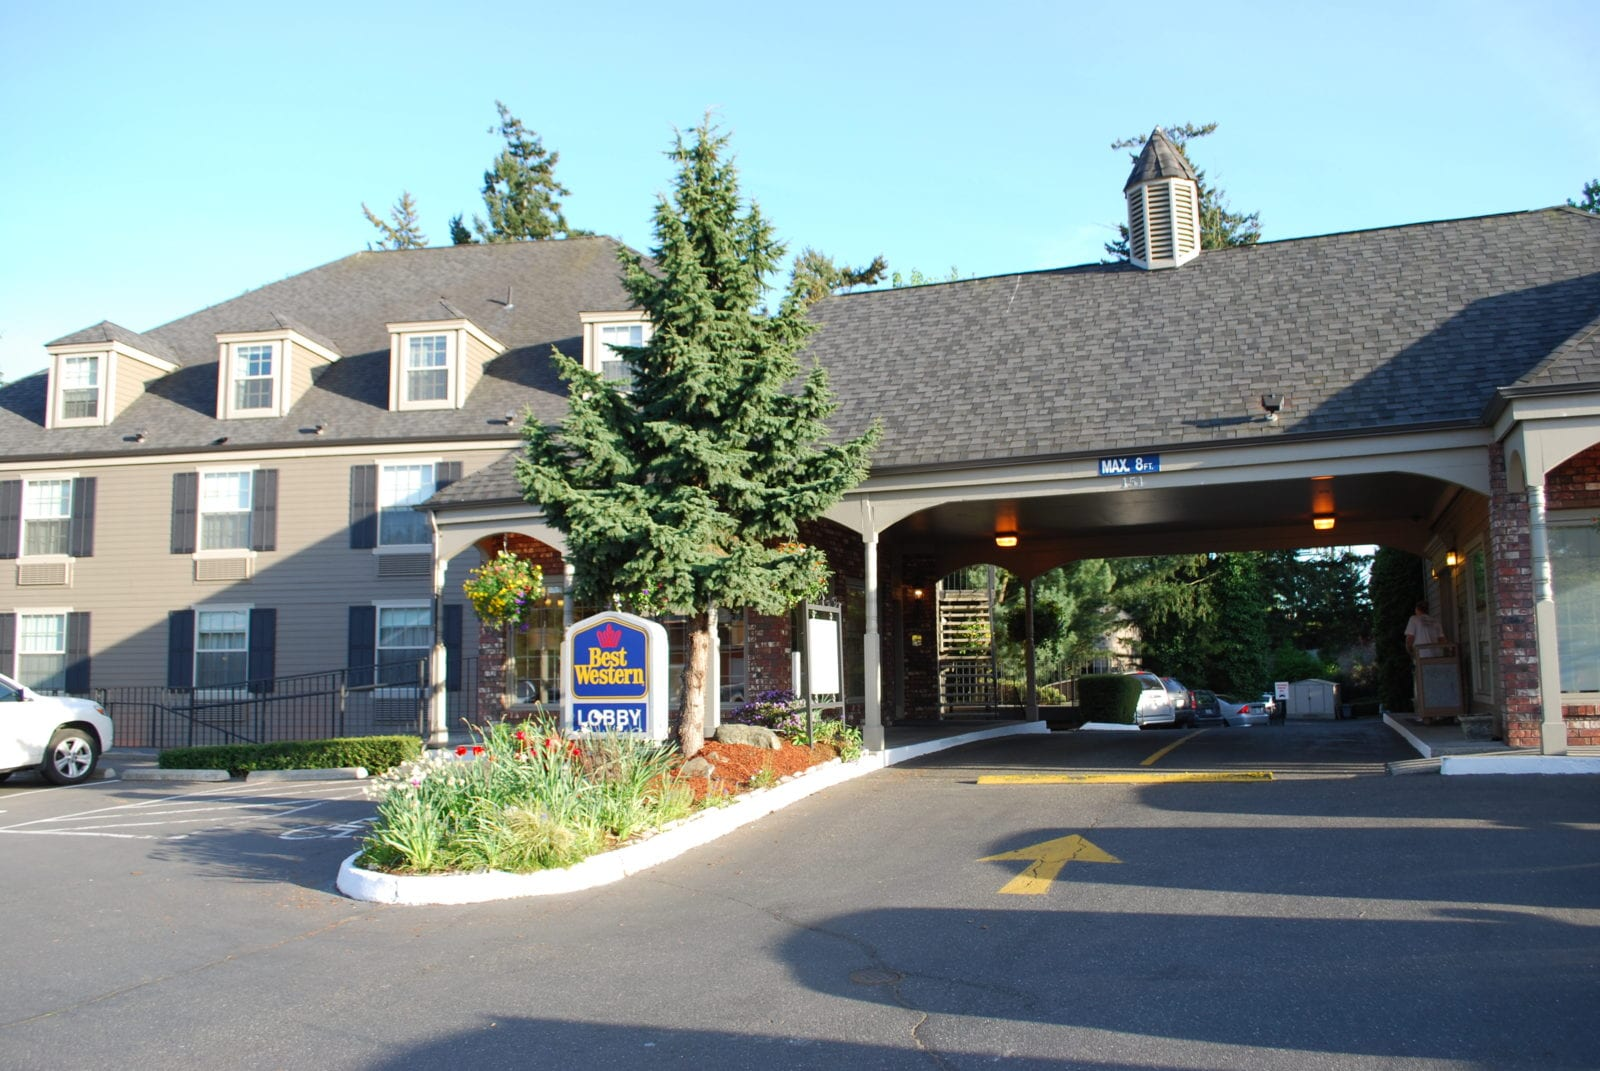 Heritage Inn at 151 McLeod Road, Bellingham, WA